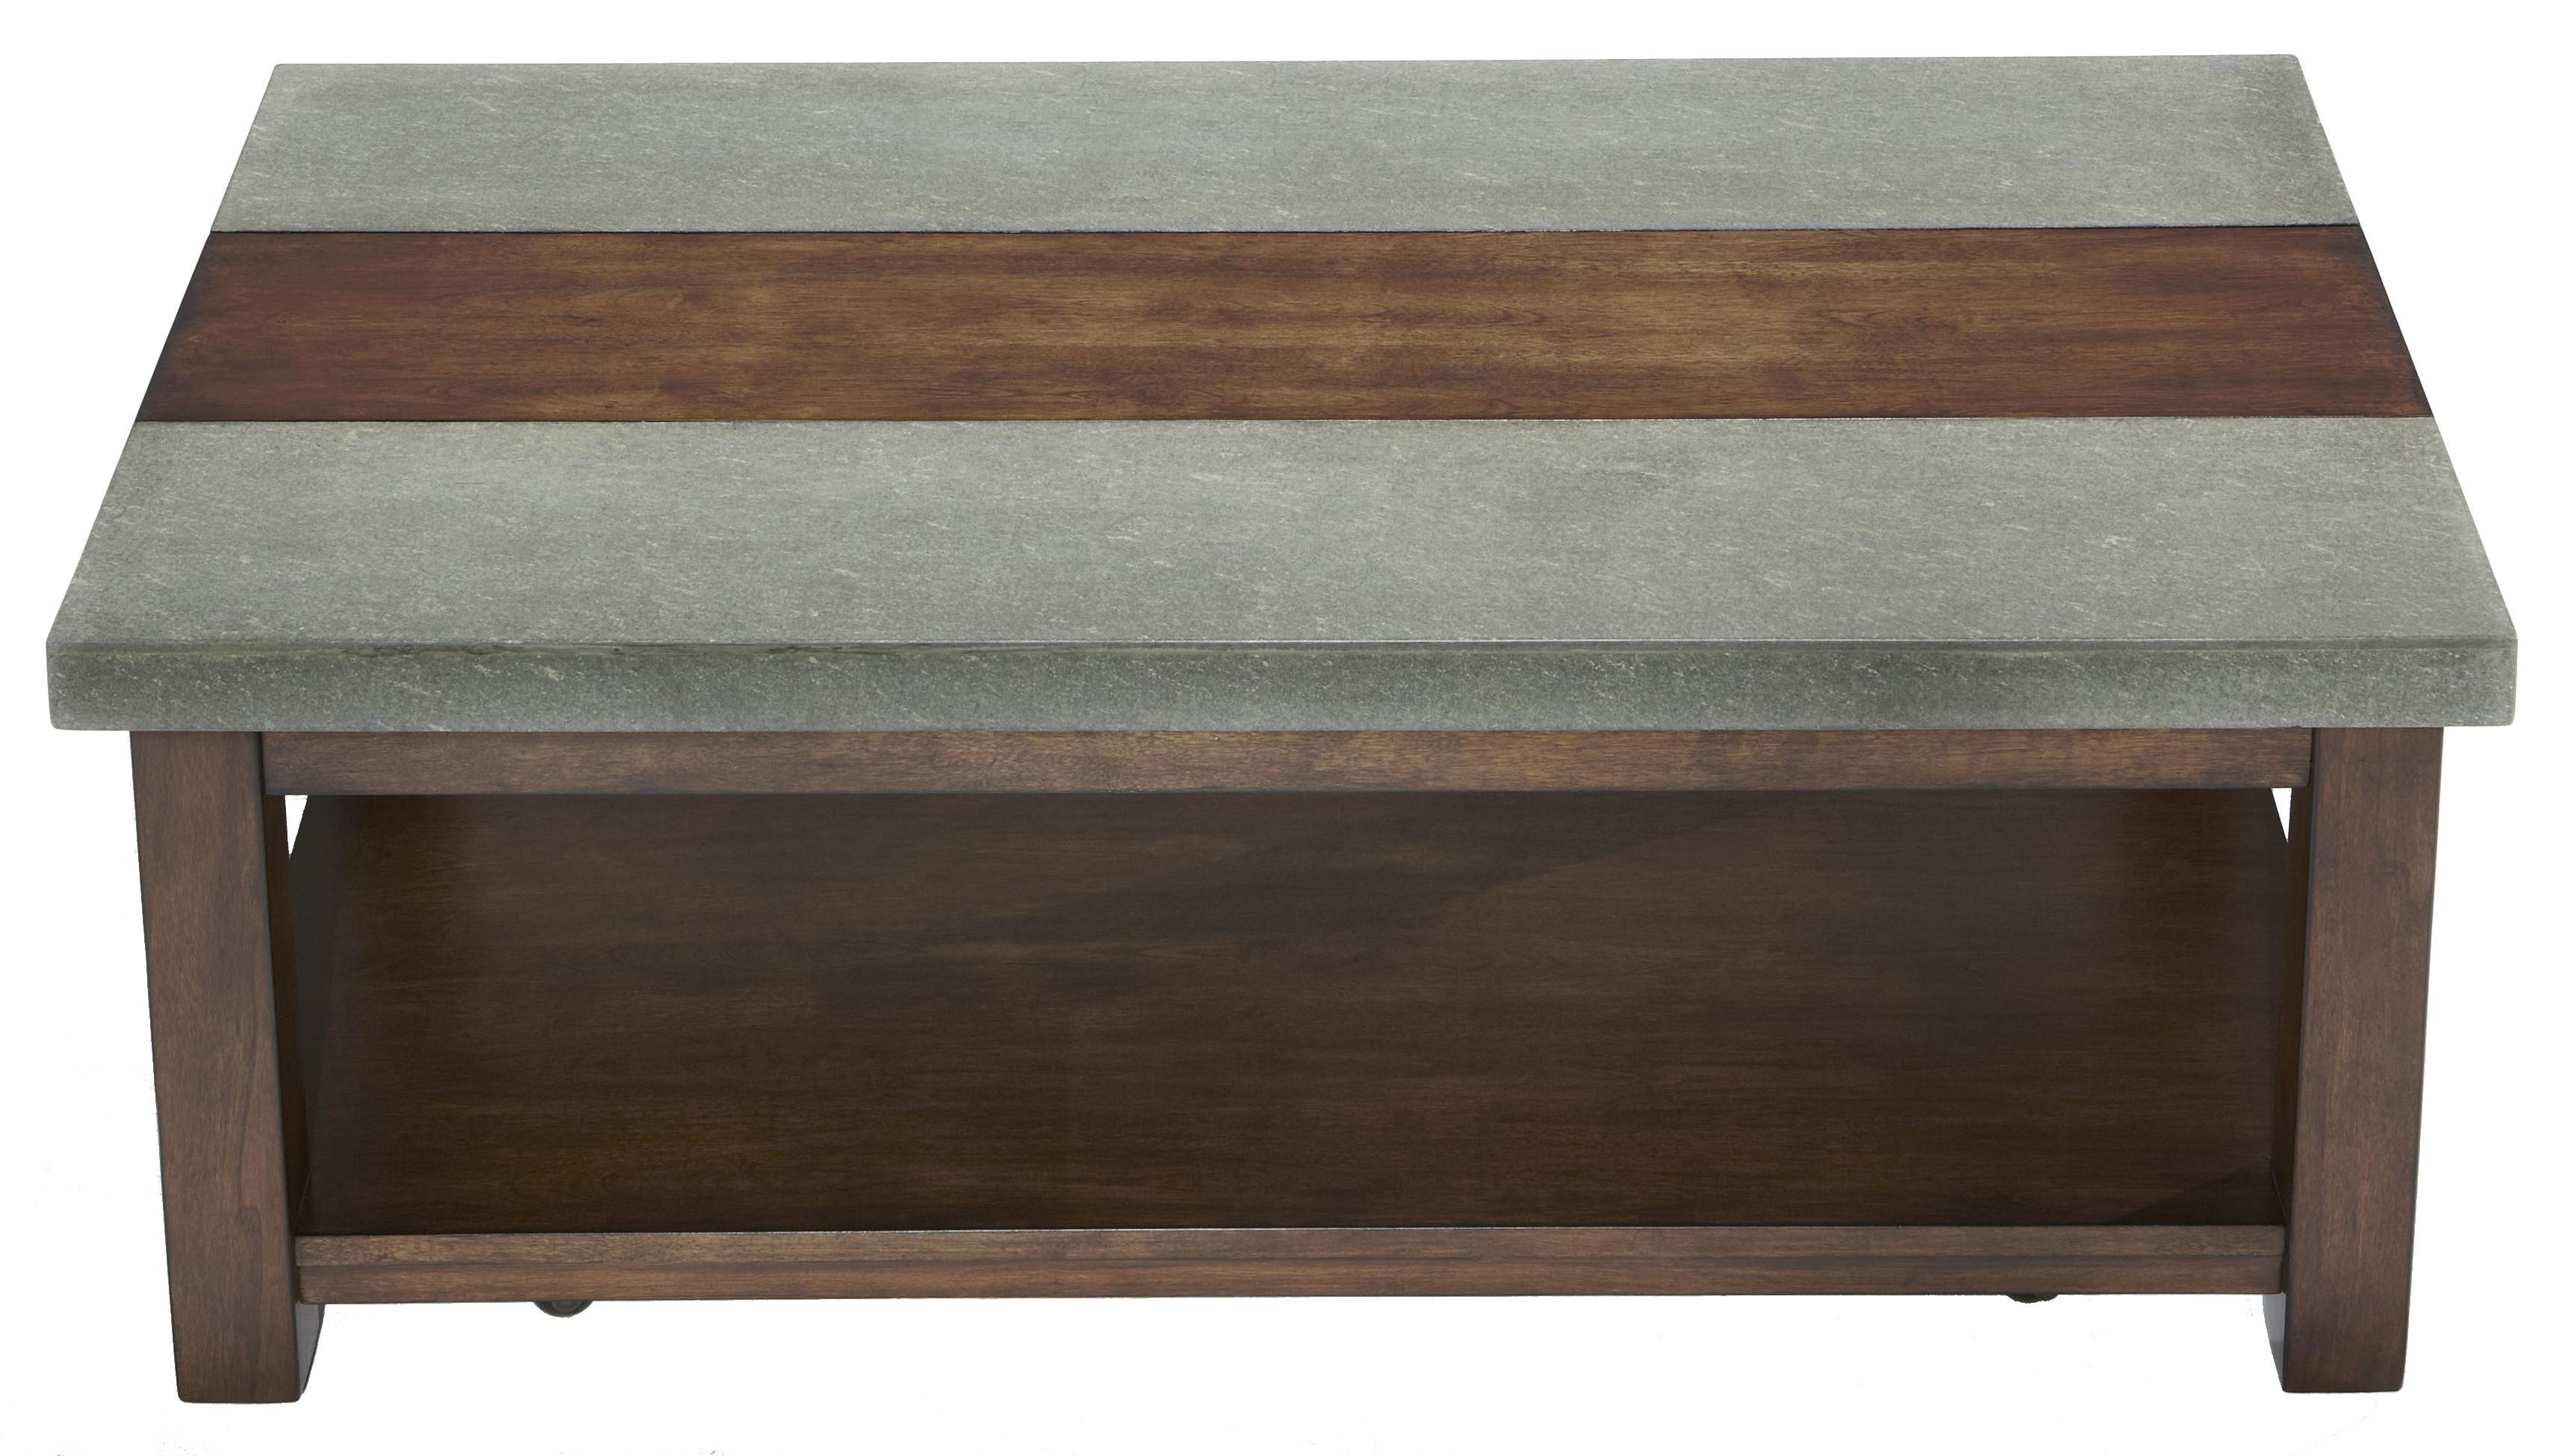 Progressive Furniture Cascade Rectangular Cocktail Table - Item Number: P426-01